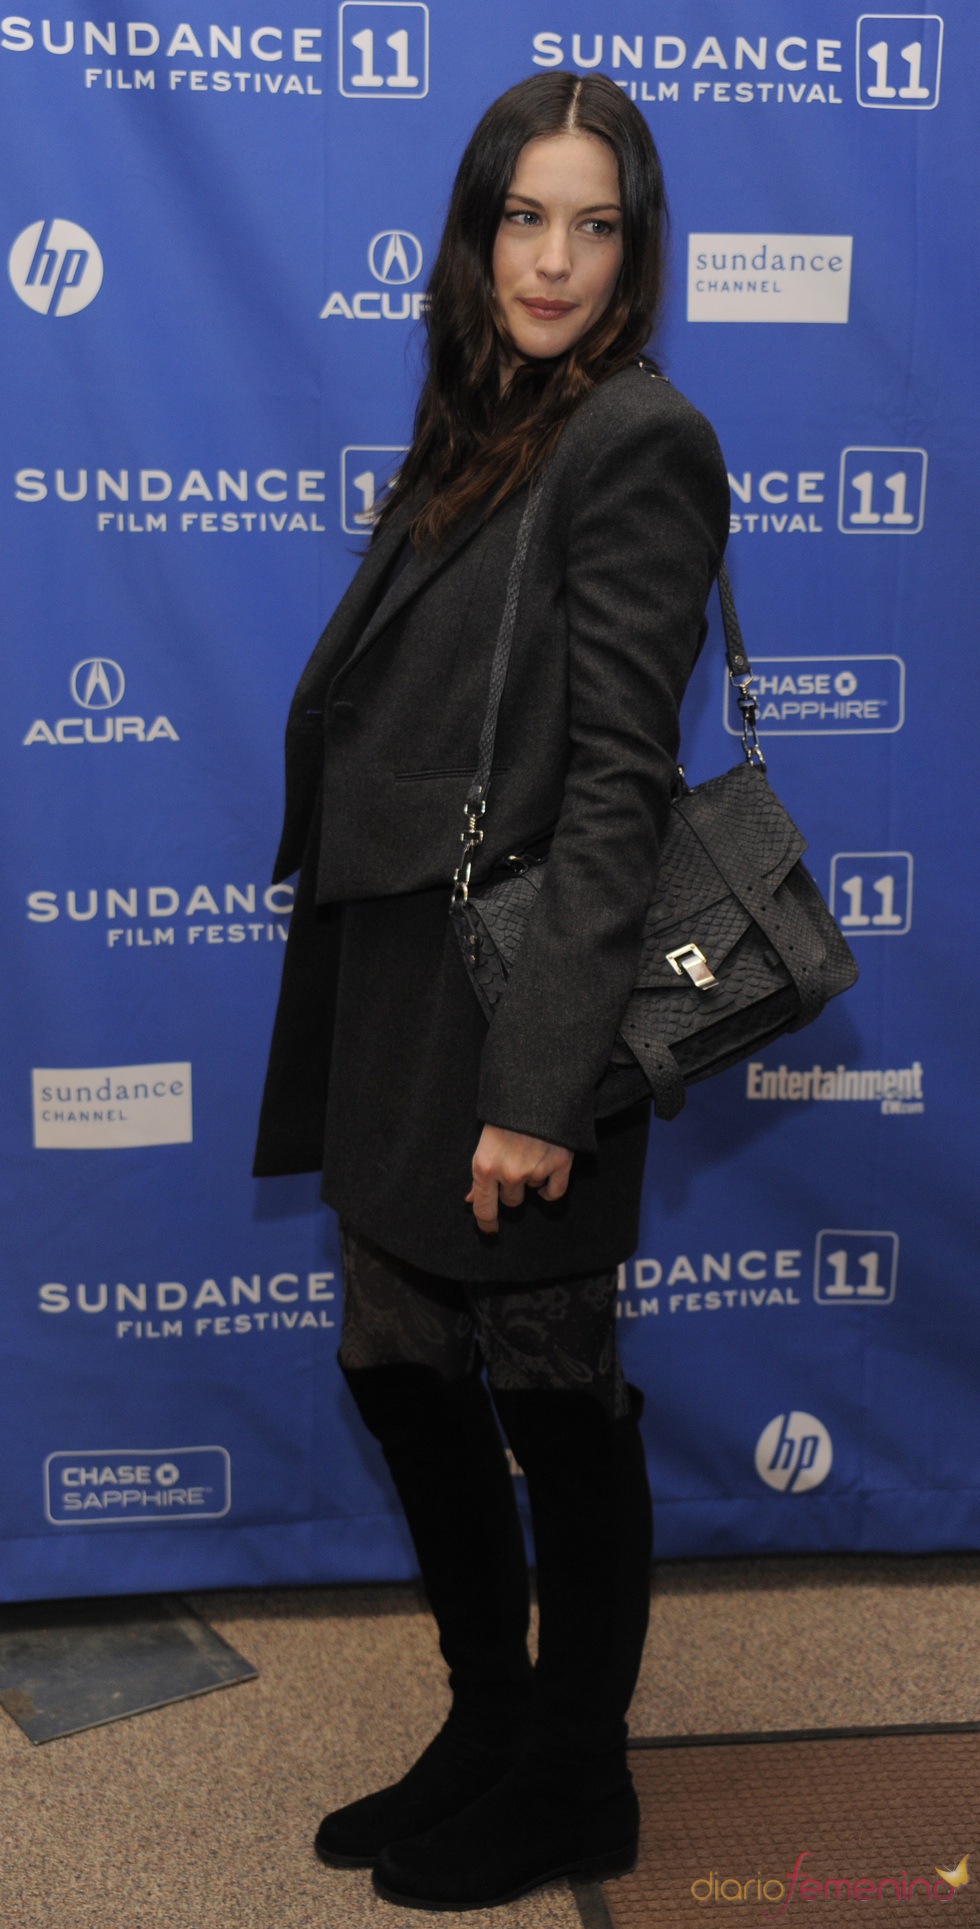 Liv Tyler en el Festival de Cine Sundance 2011